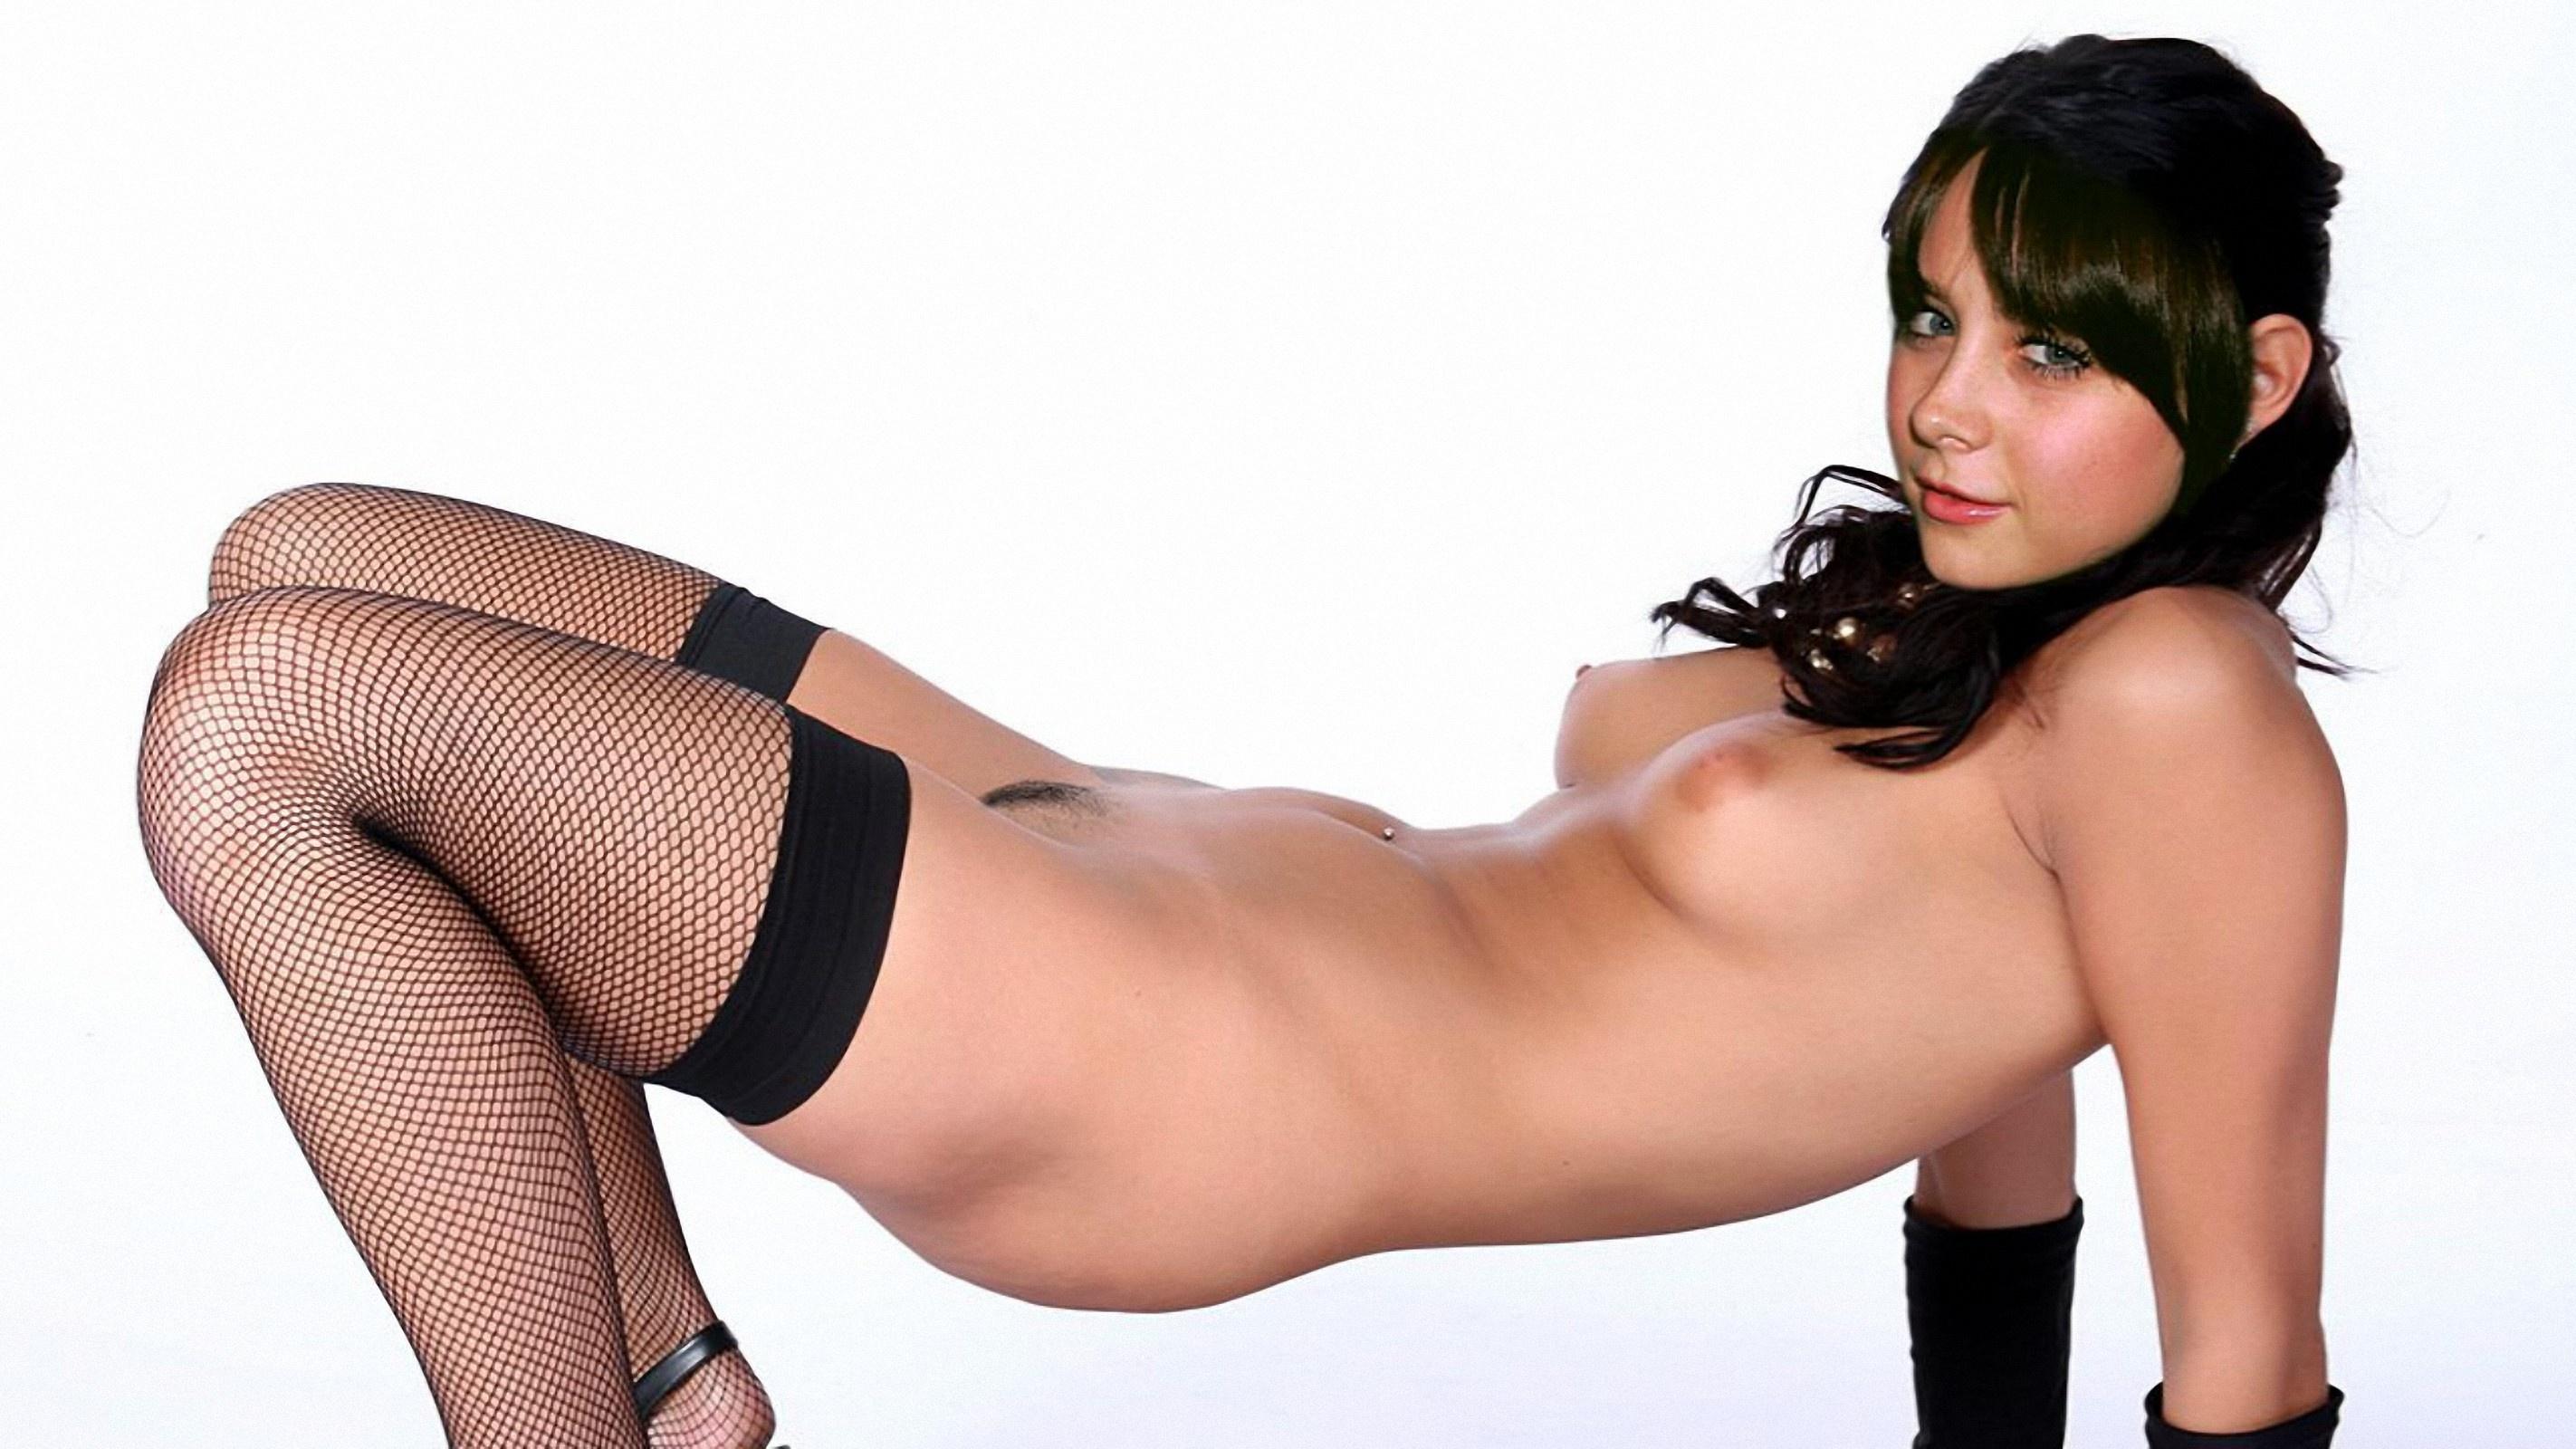 Torresani nude alessandra 60+ Hot